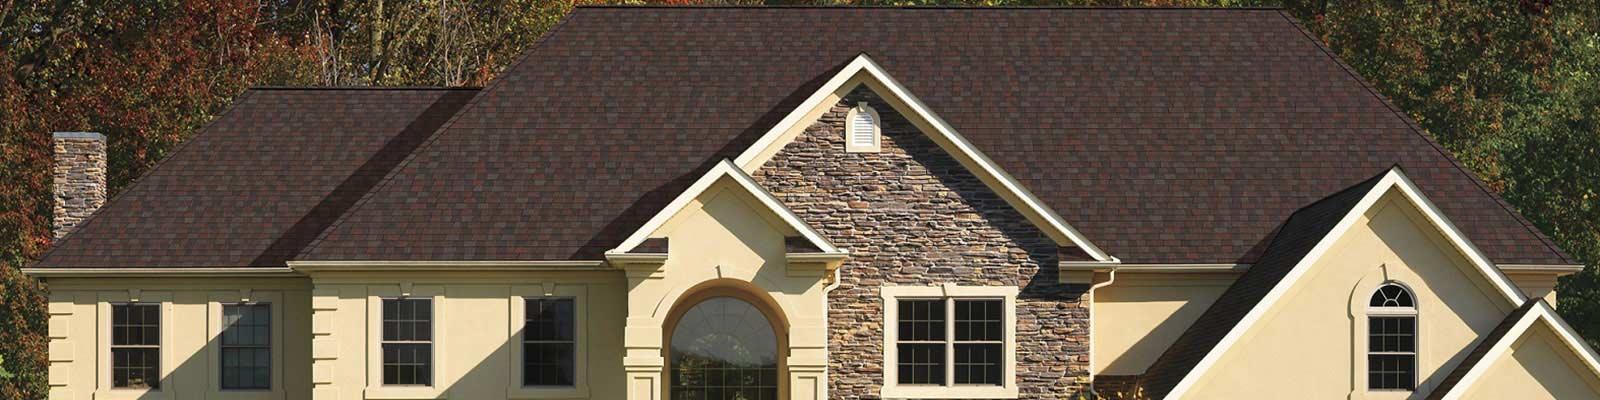 Roofing Krech Exteriors Inver Grove Heights Mn